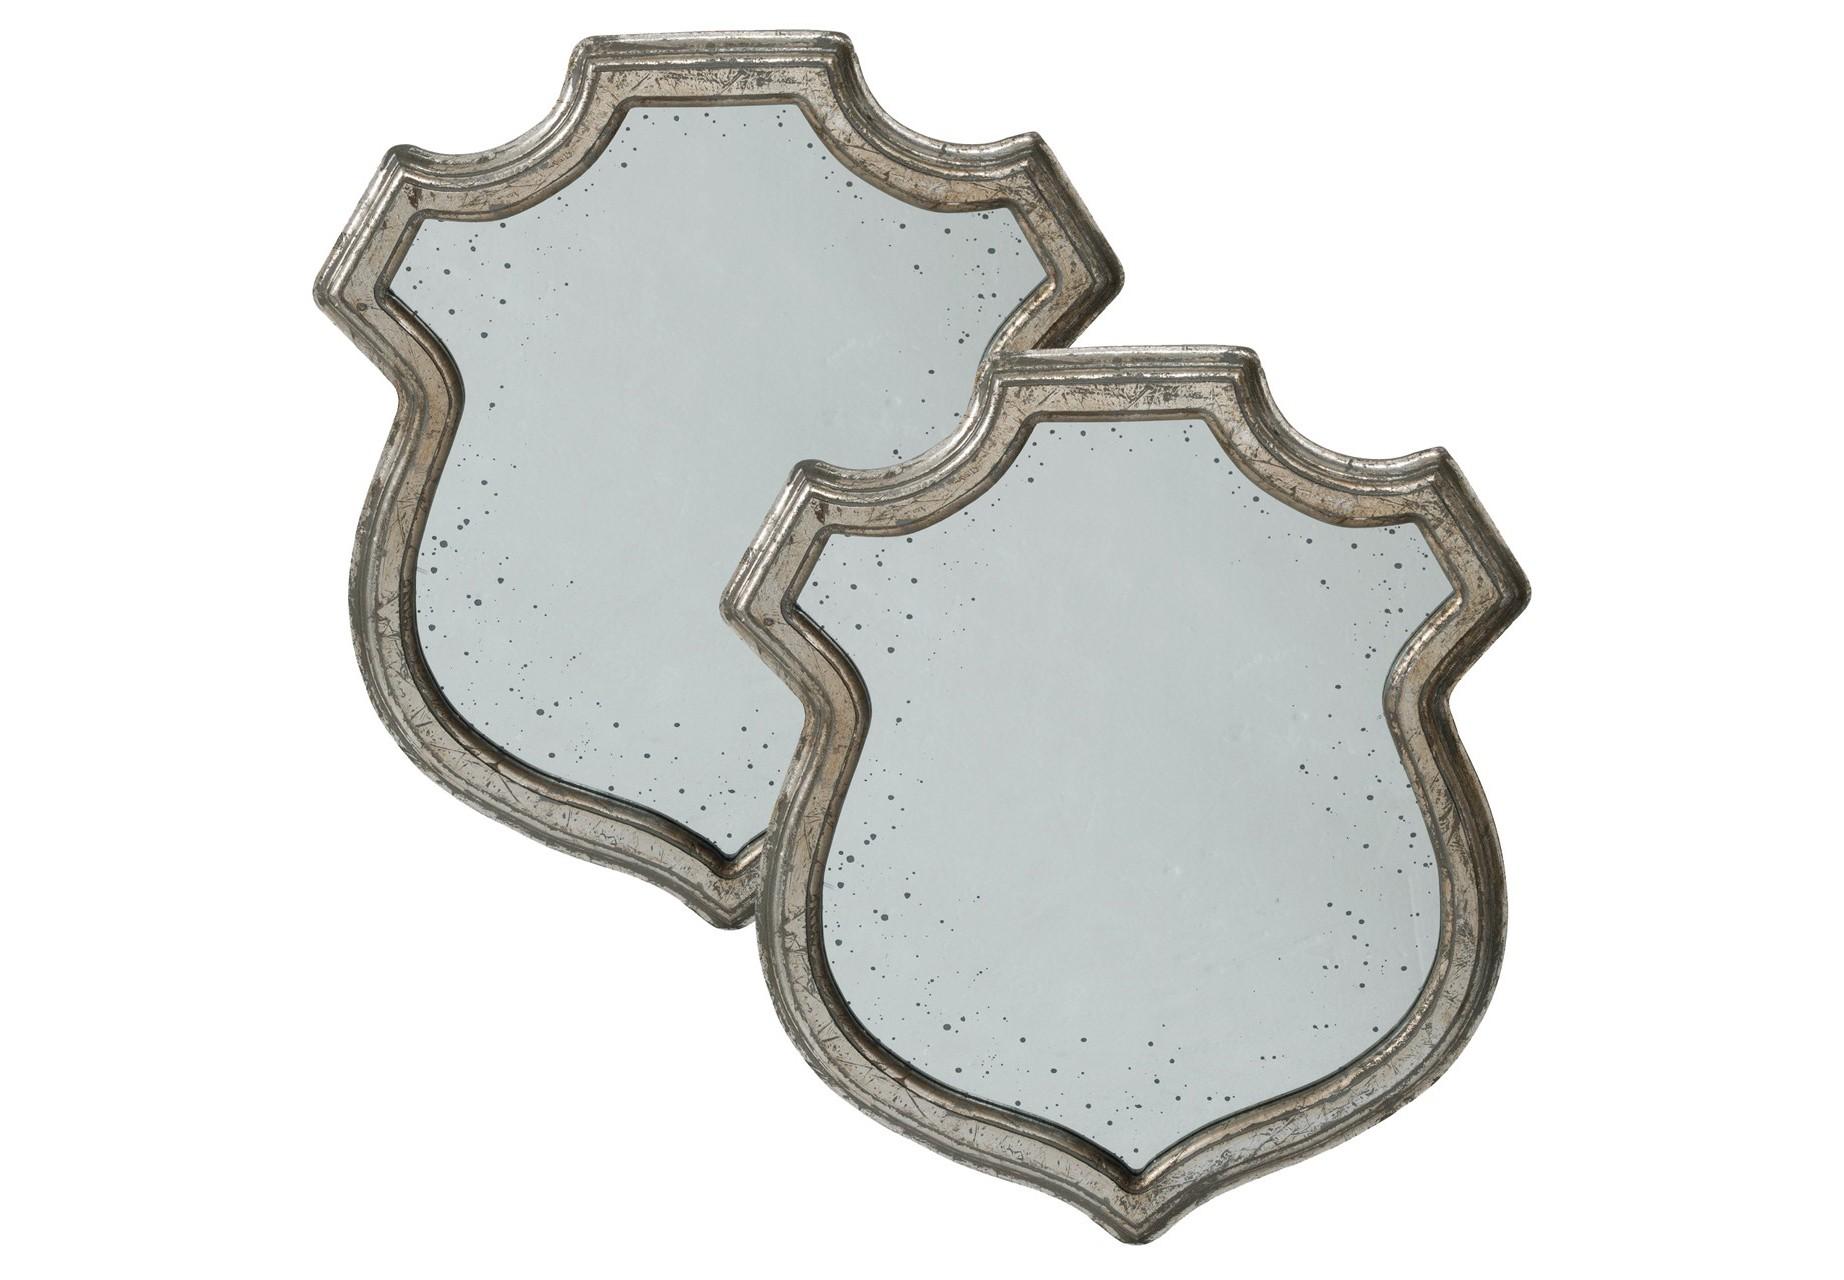 Зеркало настенное (2шт)Настенные зеркала<br><br><br>Material: Дерево<br>Width см: 33<br>Depth см: 2<br>Height см: 38